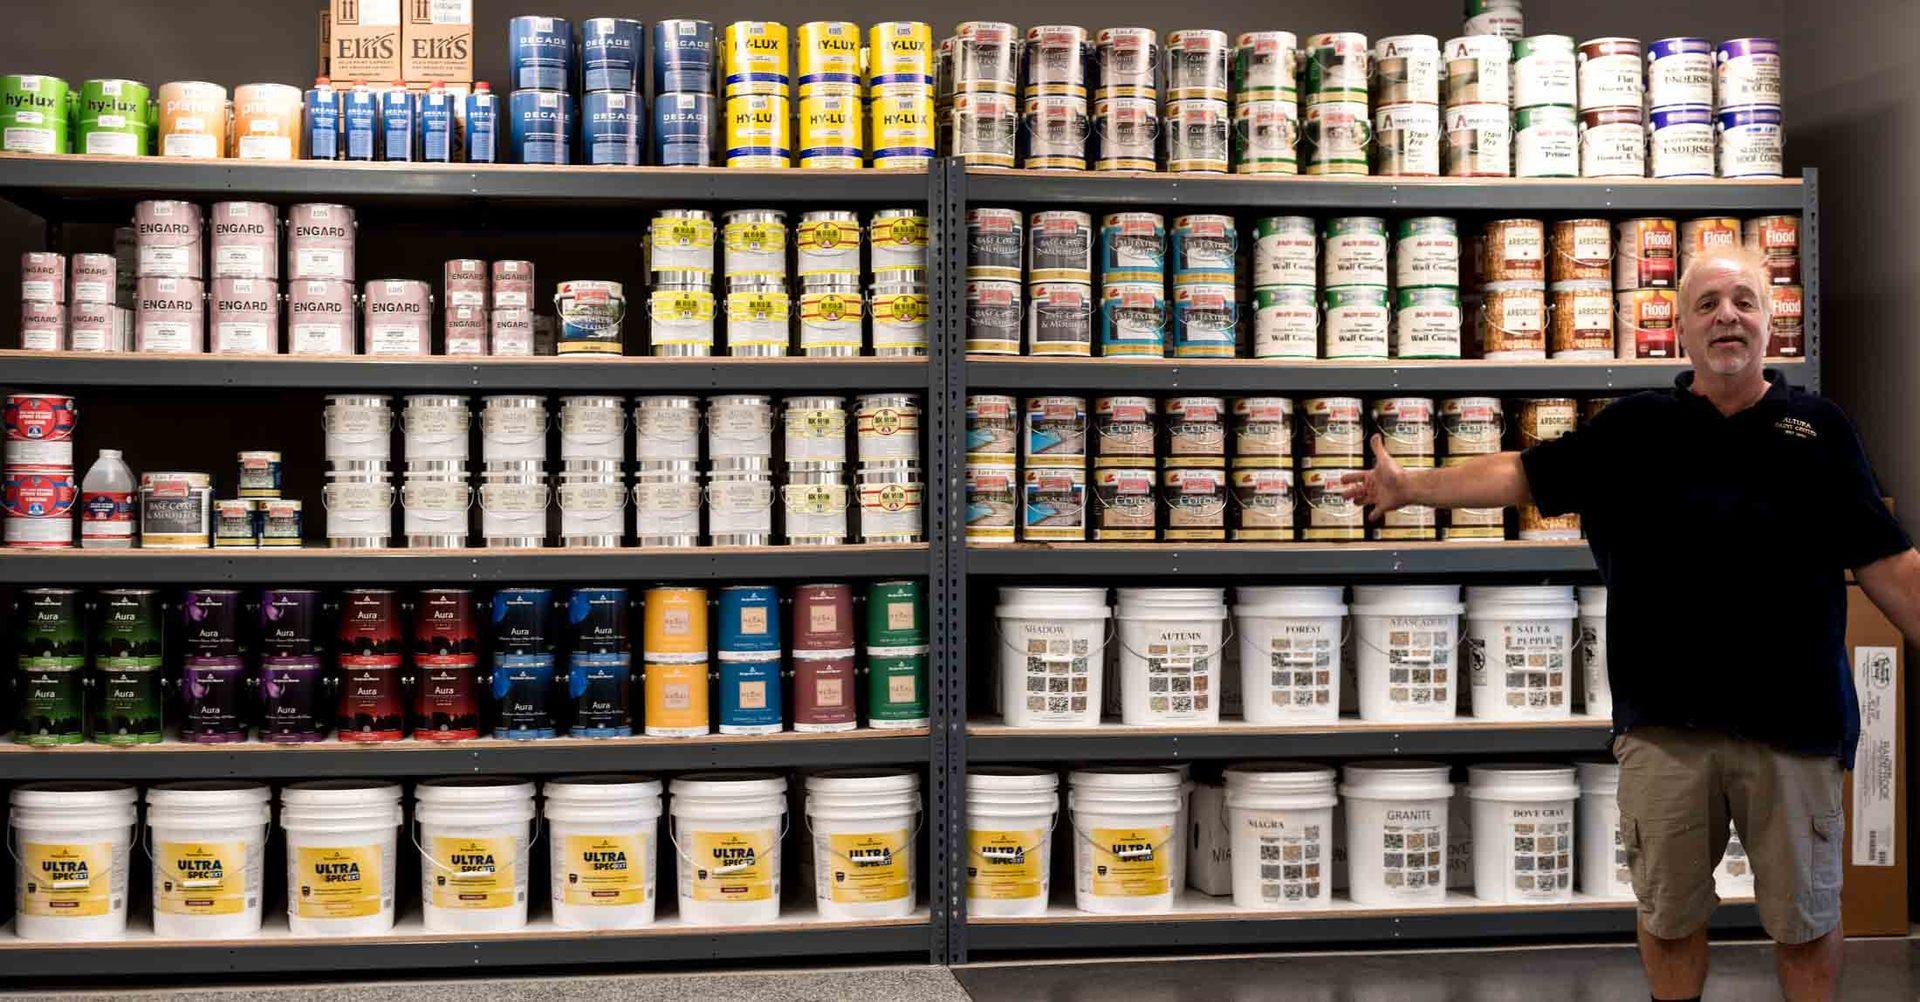 altura paint product selection